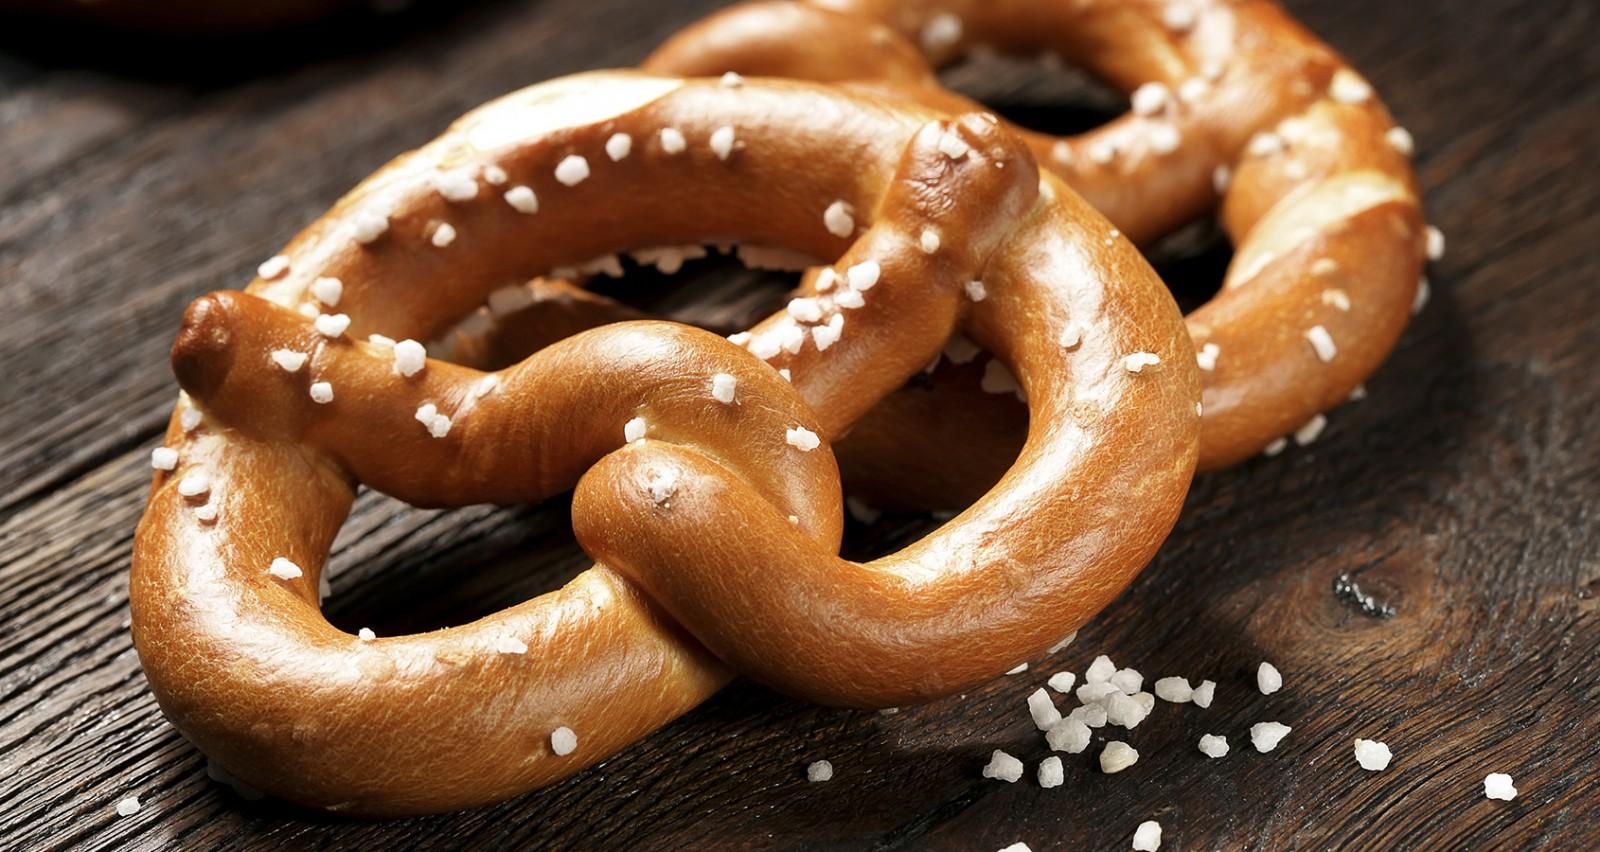 Great British Bake Off: pretzel recipe